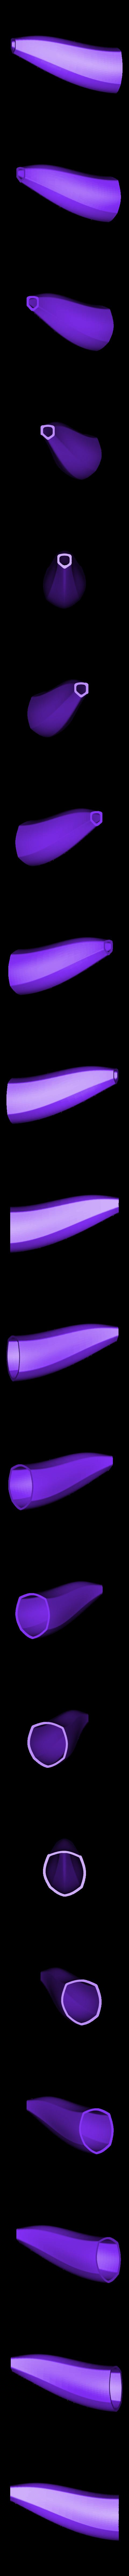 Banane_3D_2_tete.STL Download free STL file Lulu's Banana box • 3D printing model, lulu3Dbuilder